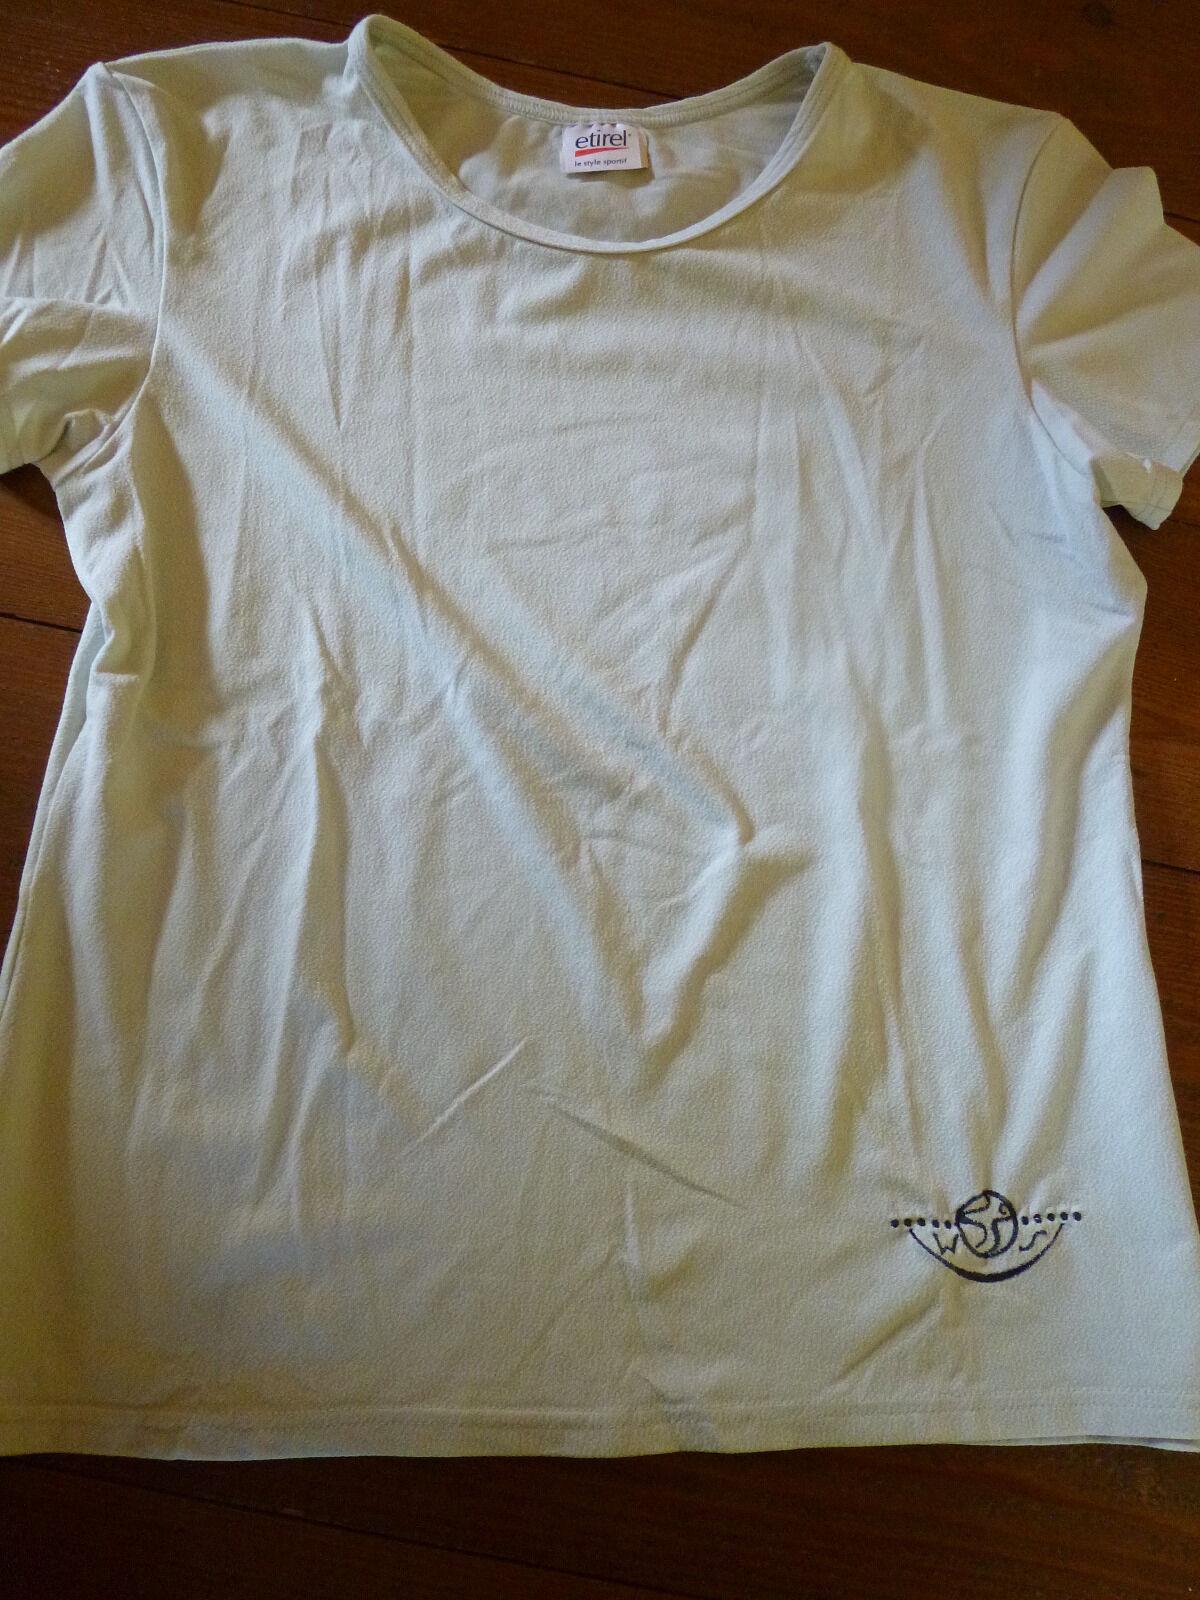 Etirel Strukturshirt Sportshirt Gr. 36 S lindgrün Neu !